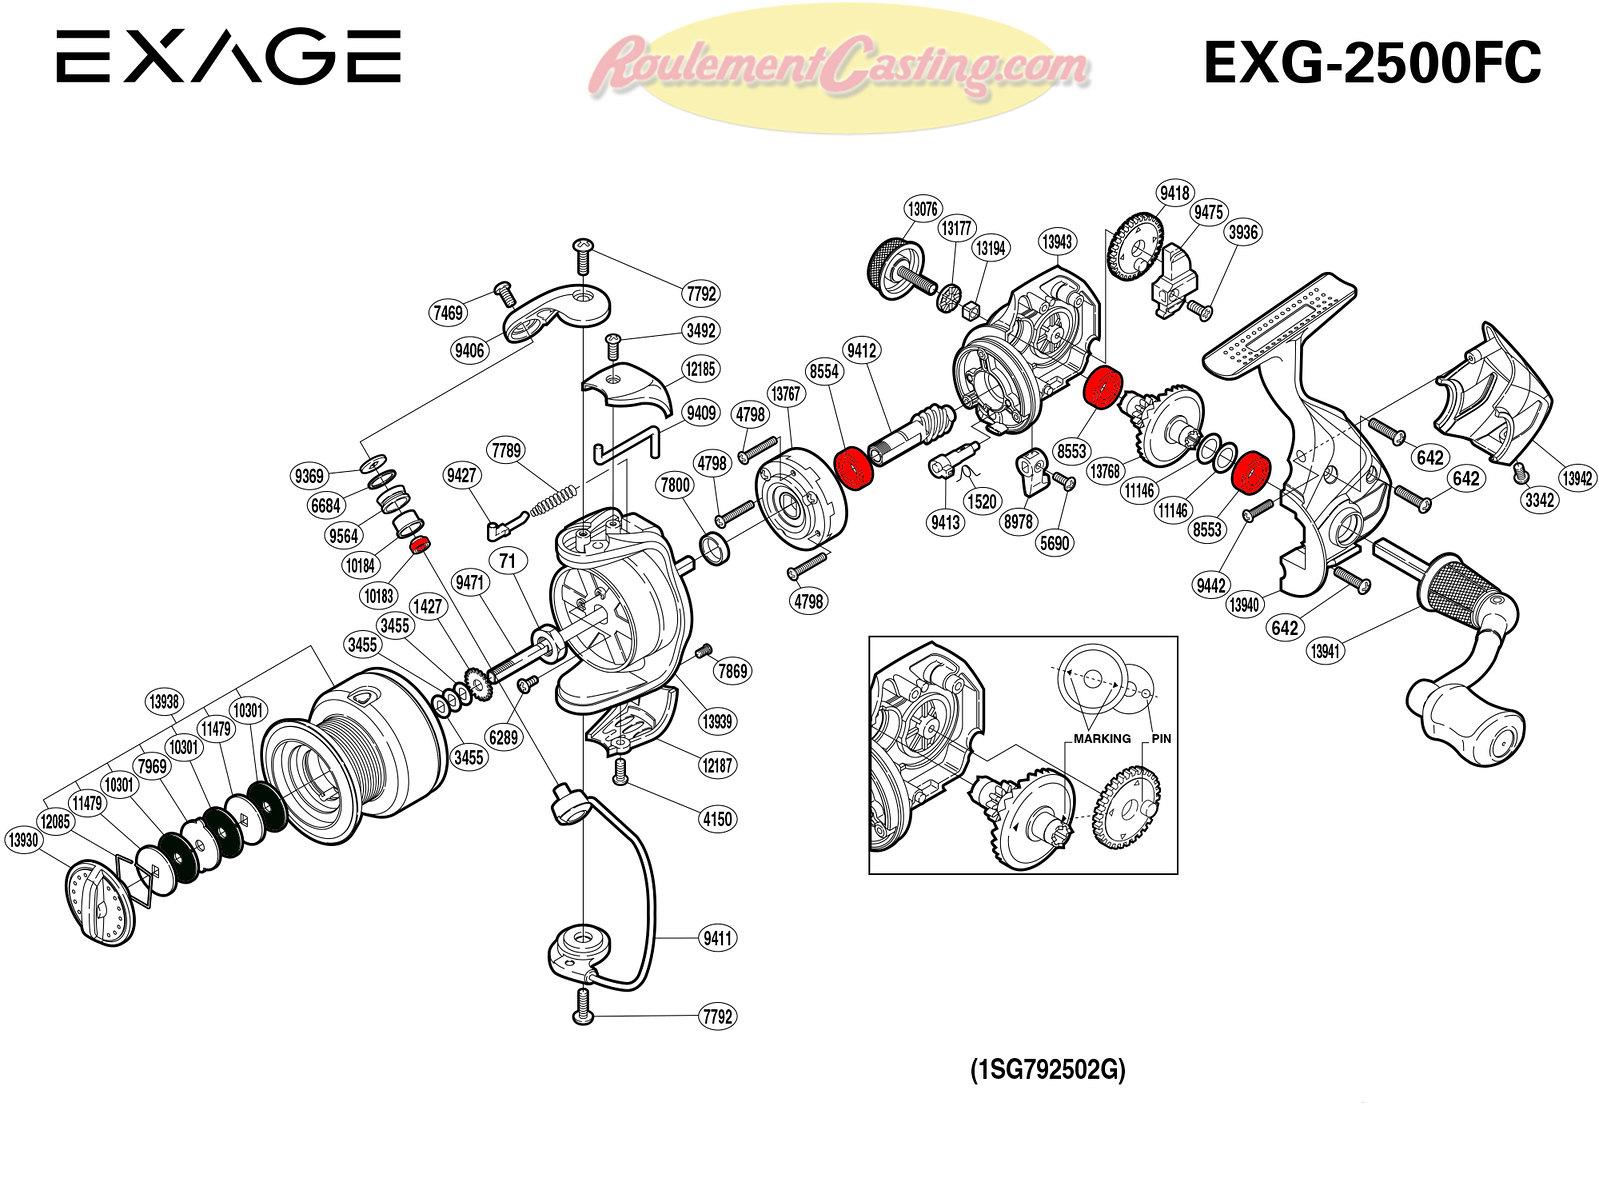 Schema-Shimano-EXAGE-2500FC